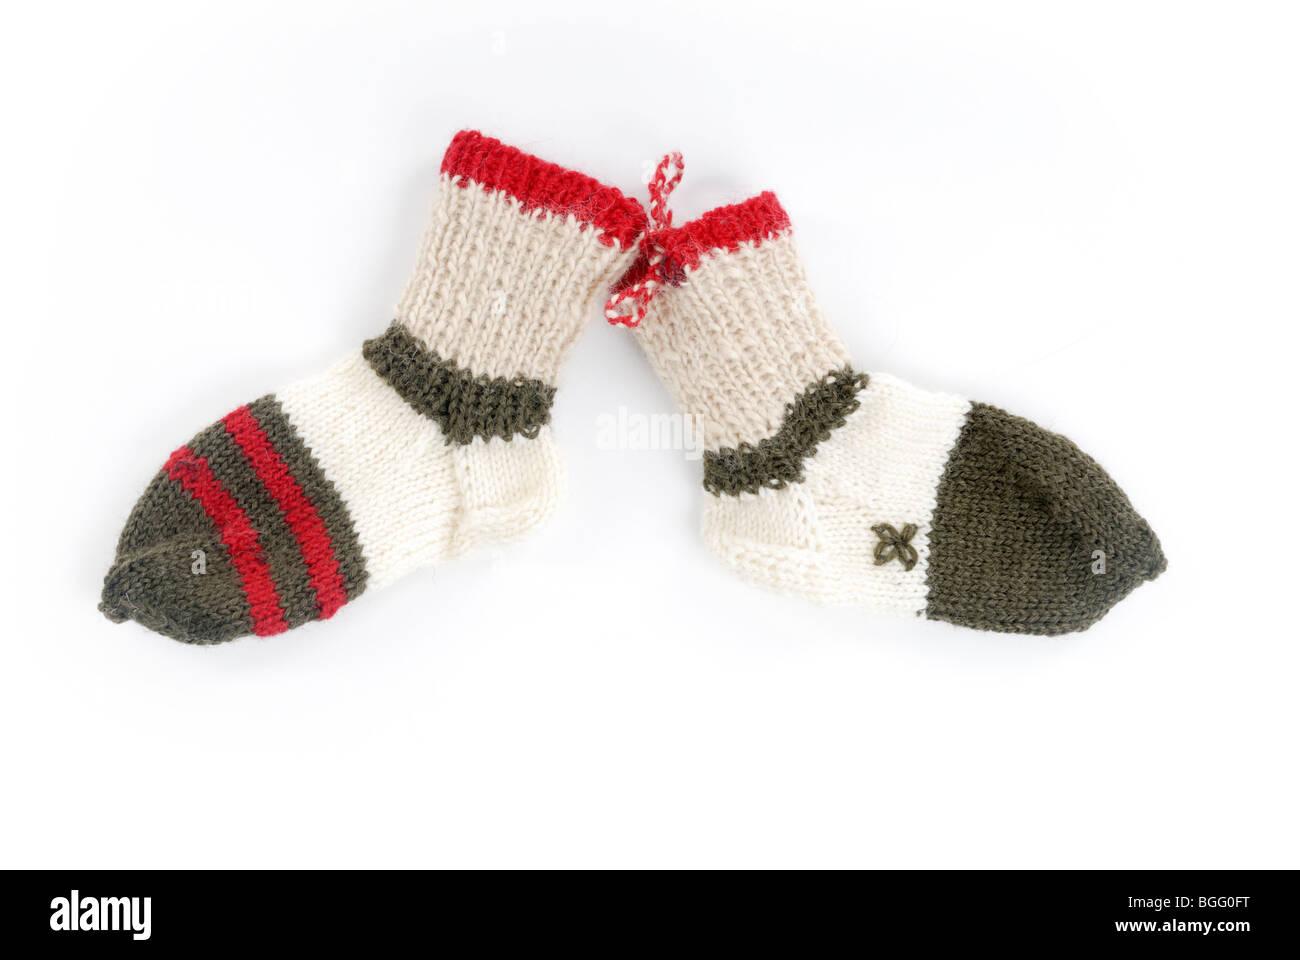 Thick Wool Socks Imágenes De Stock & Thick Wool Socks Fotos De Stock ...